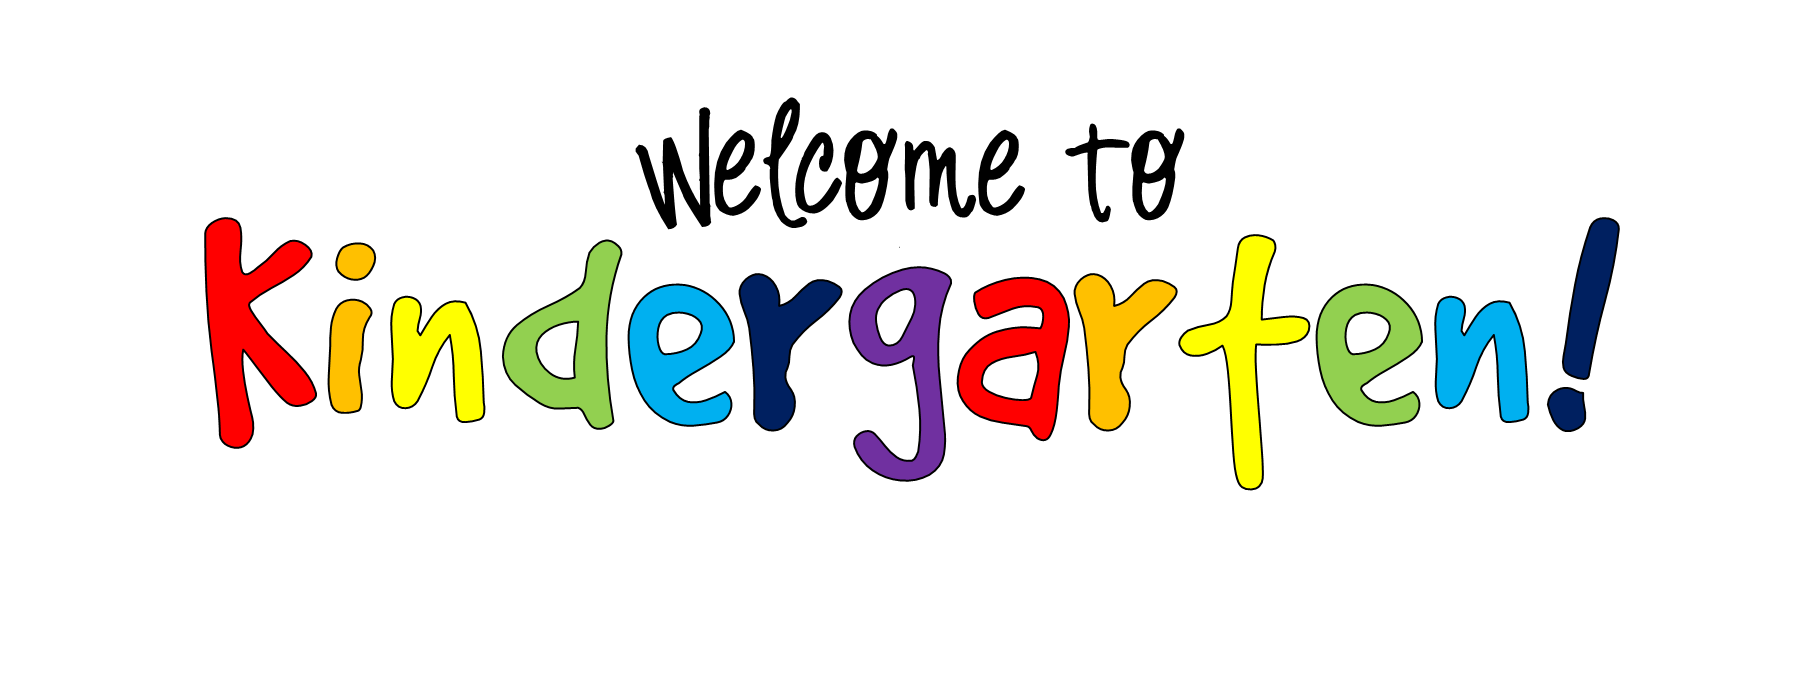 Newsletter clipart grade school. Kindergarten mokapu elementary